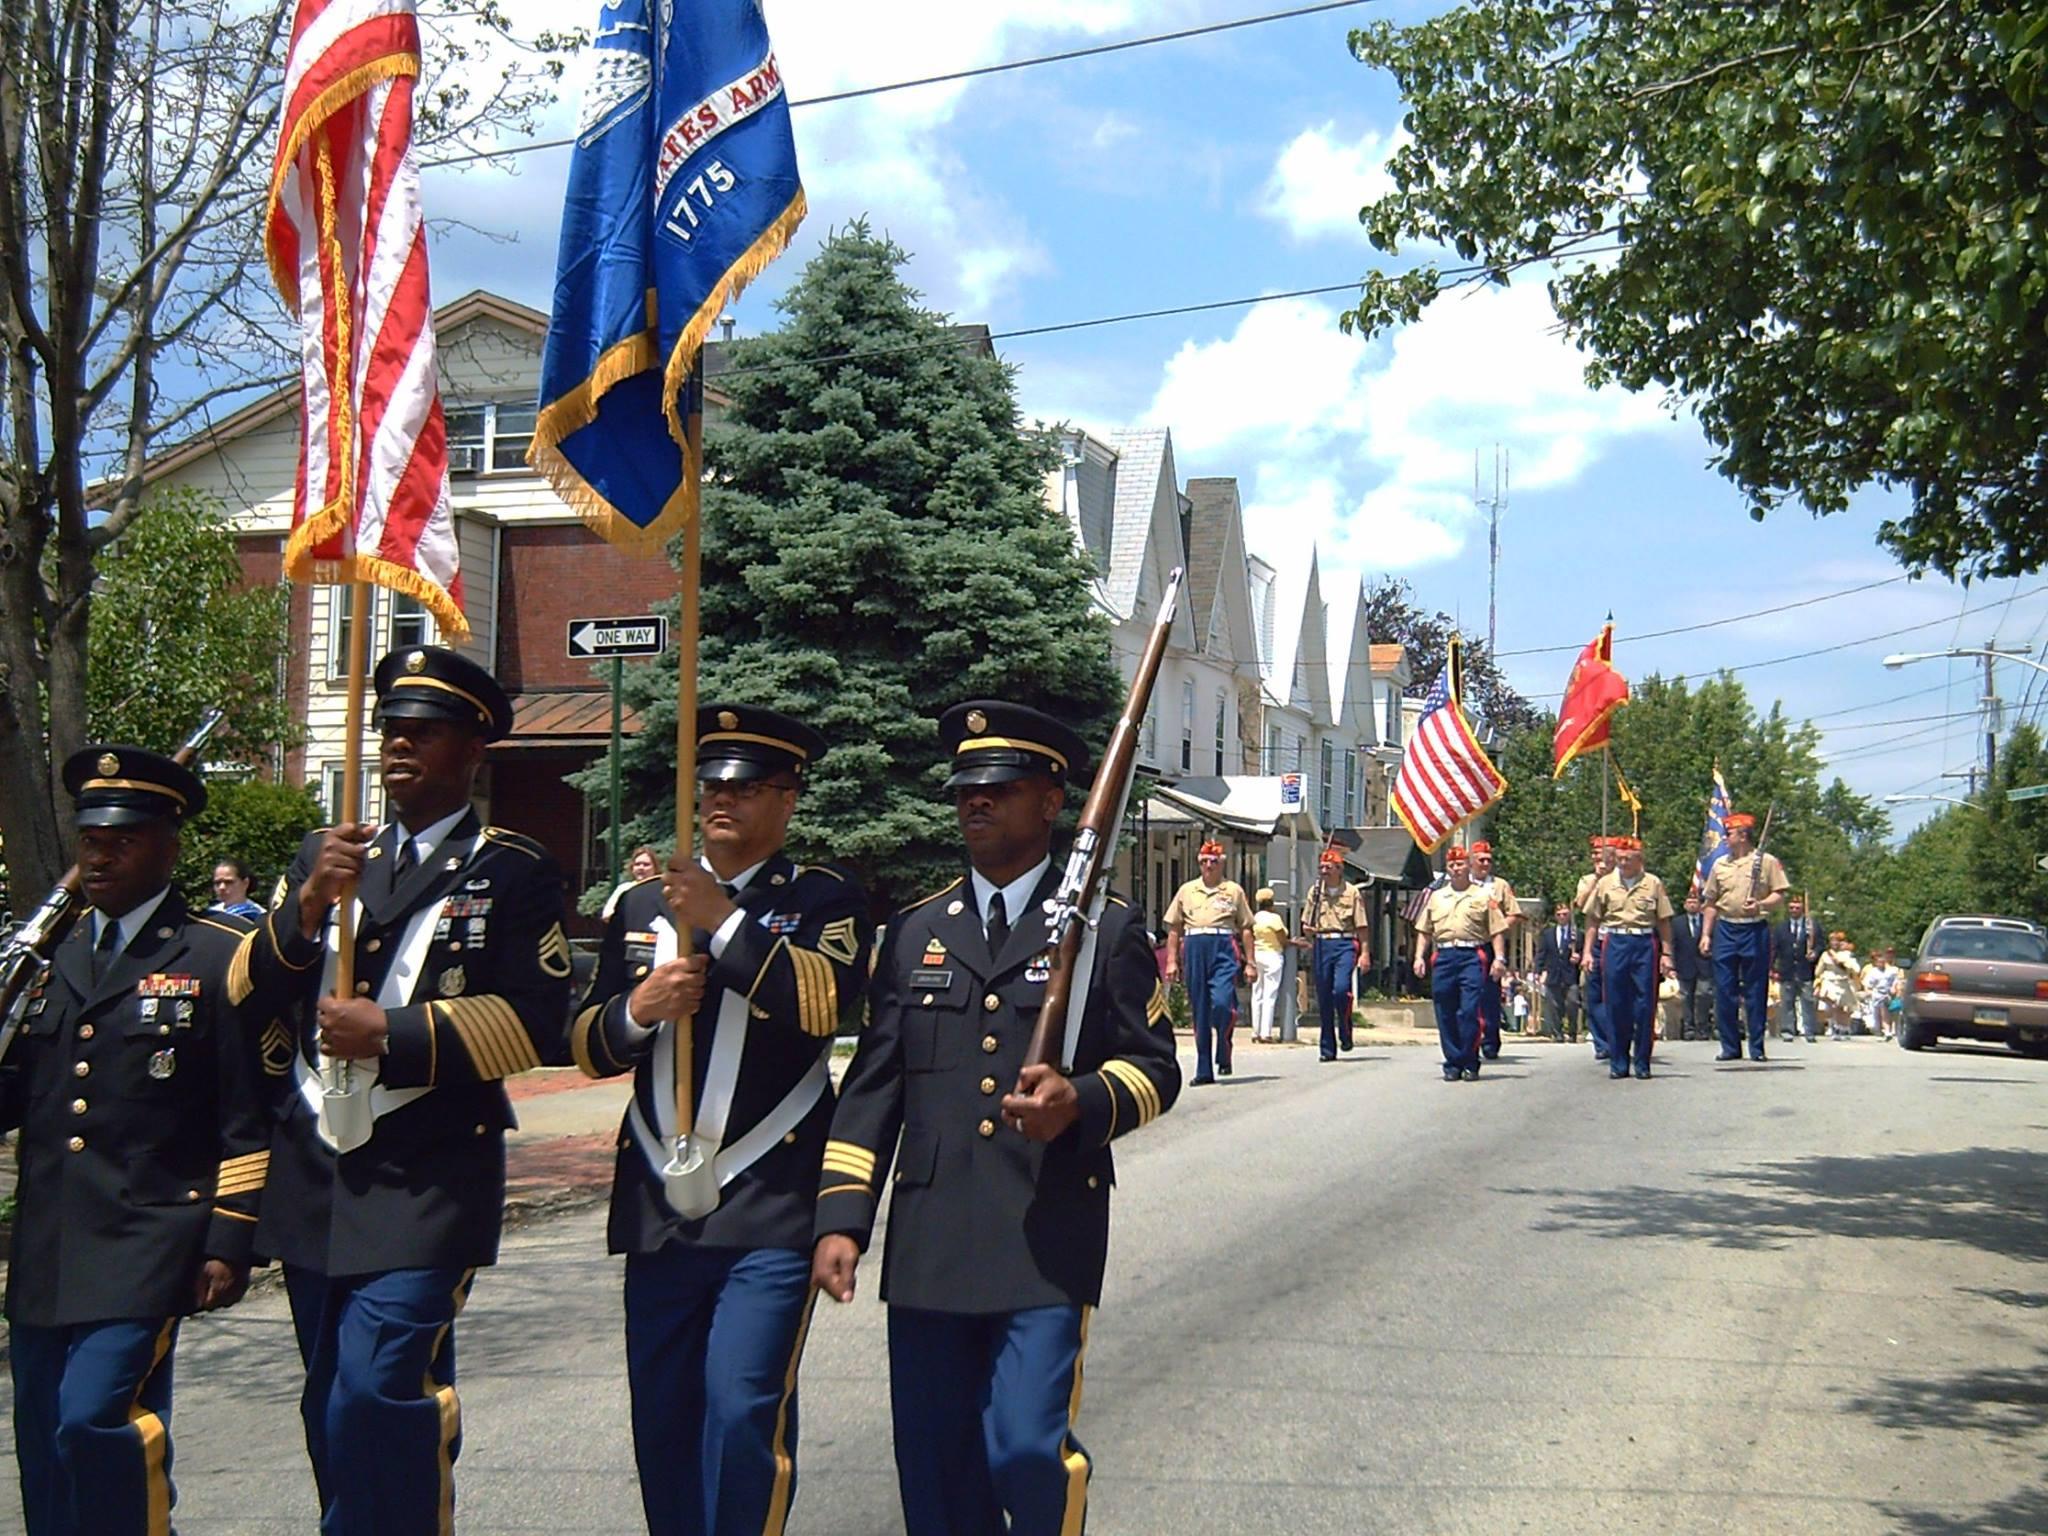 Wissahickon War Memorial, Memorial Day Parade